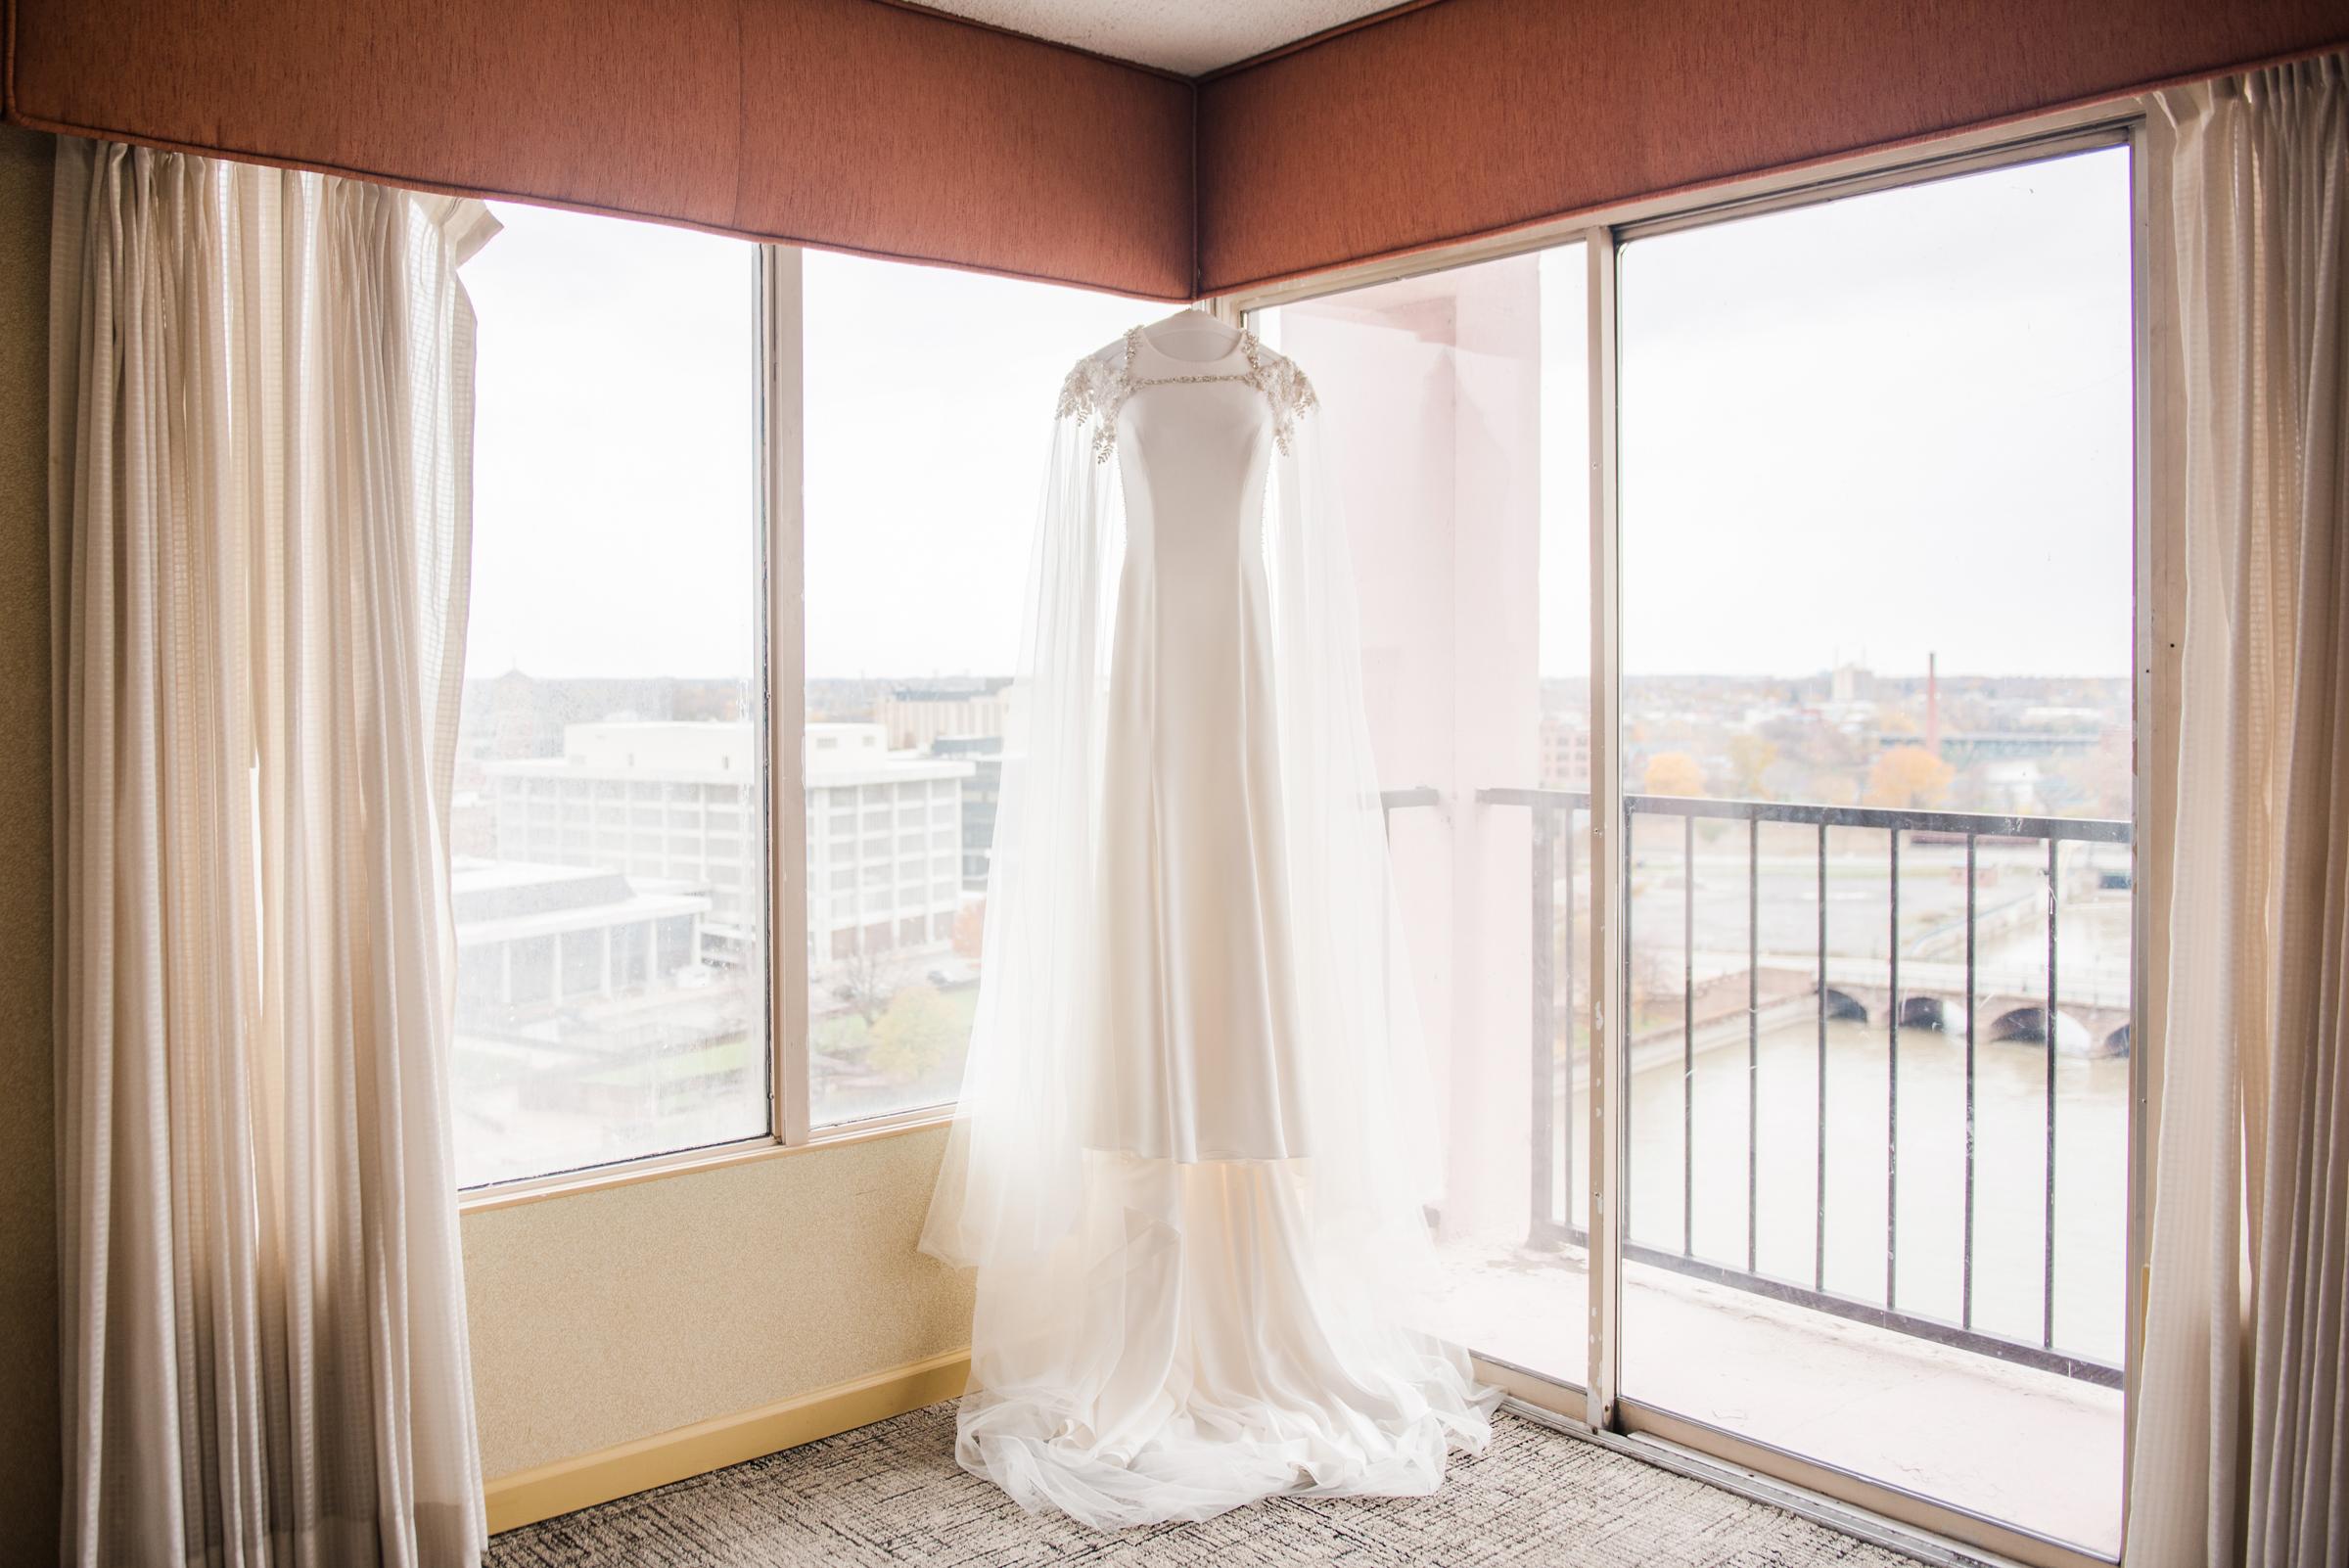 Wintergarden_by_Monroes_Rochester_Wedding_JILL_STUDIO_Rochester_NY_Photographer_151411.jpg